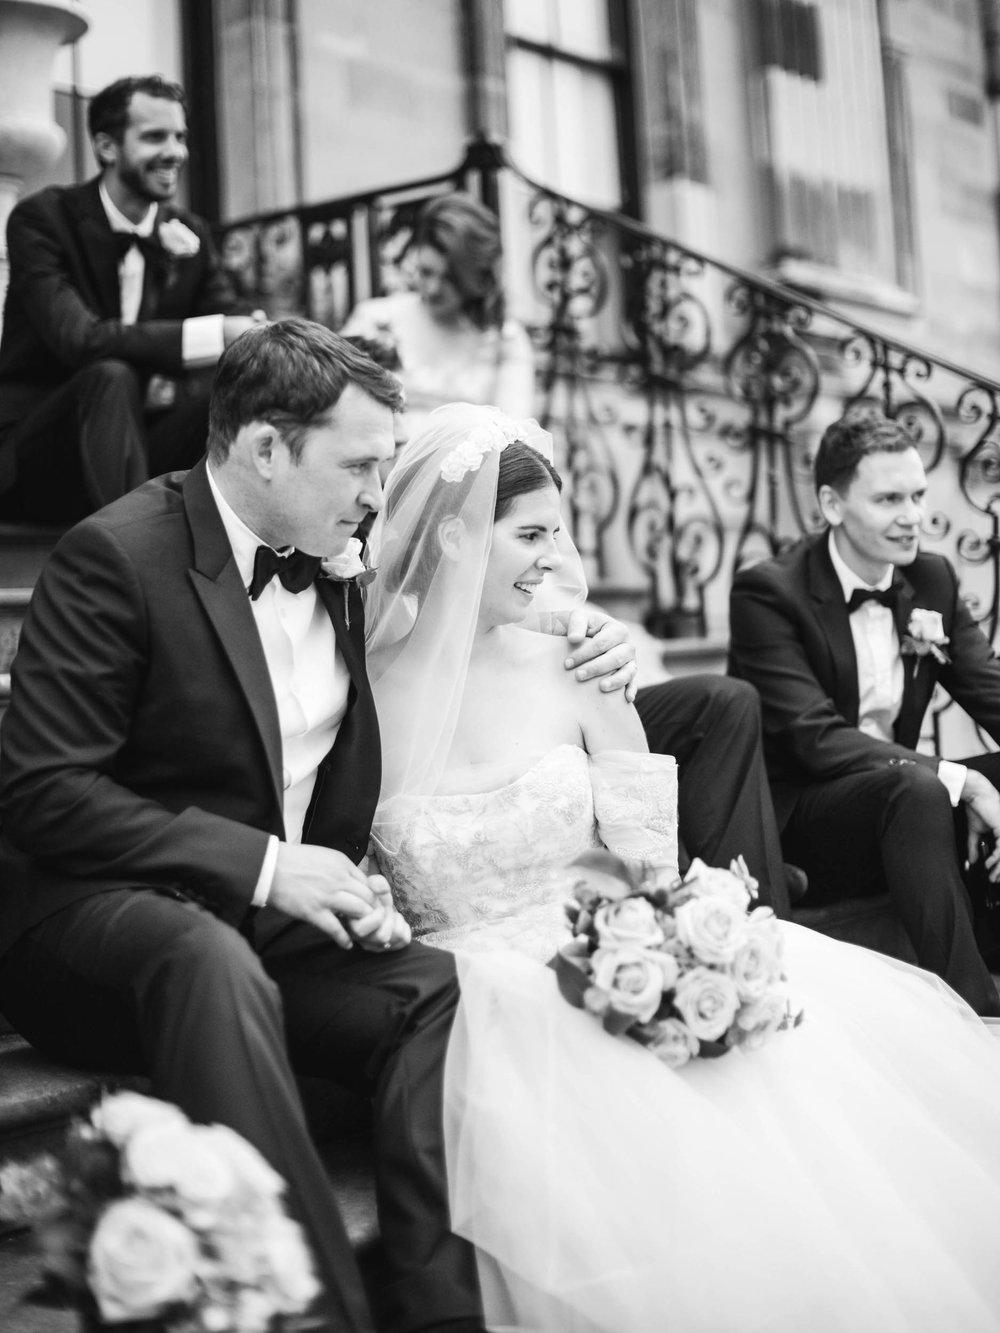 Amy O'Boyle Photography- Destination & UK Fine Art Film Wedding Photographer- Stoneleigh Abbey Wedding-1.jpg